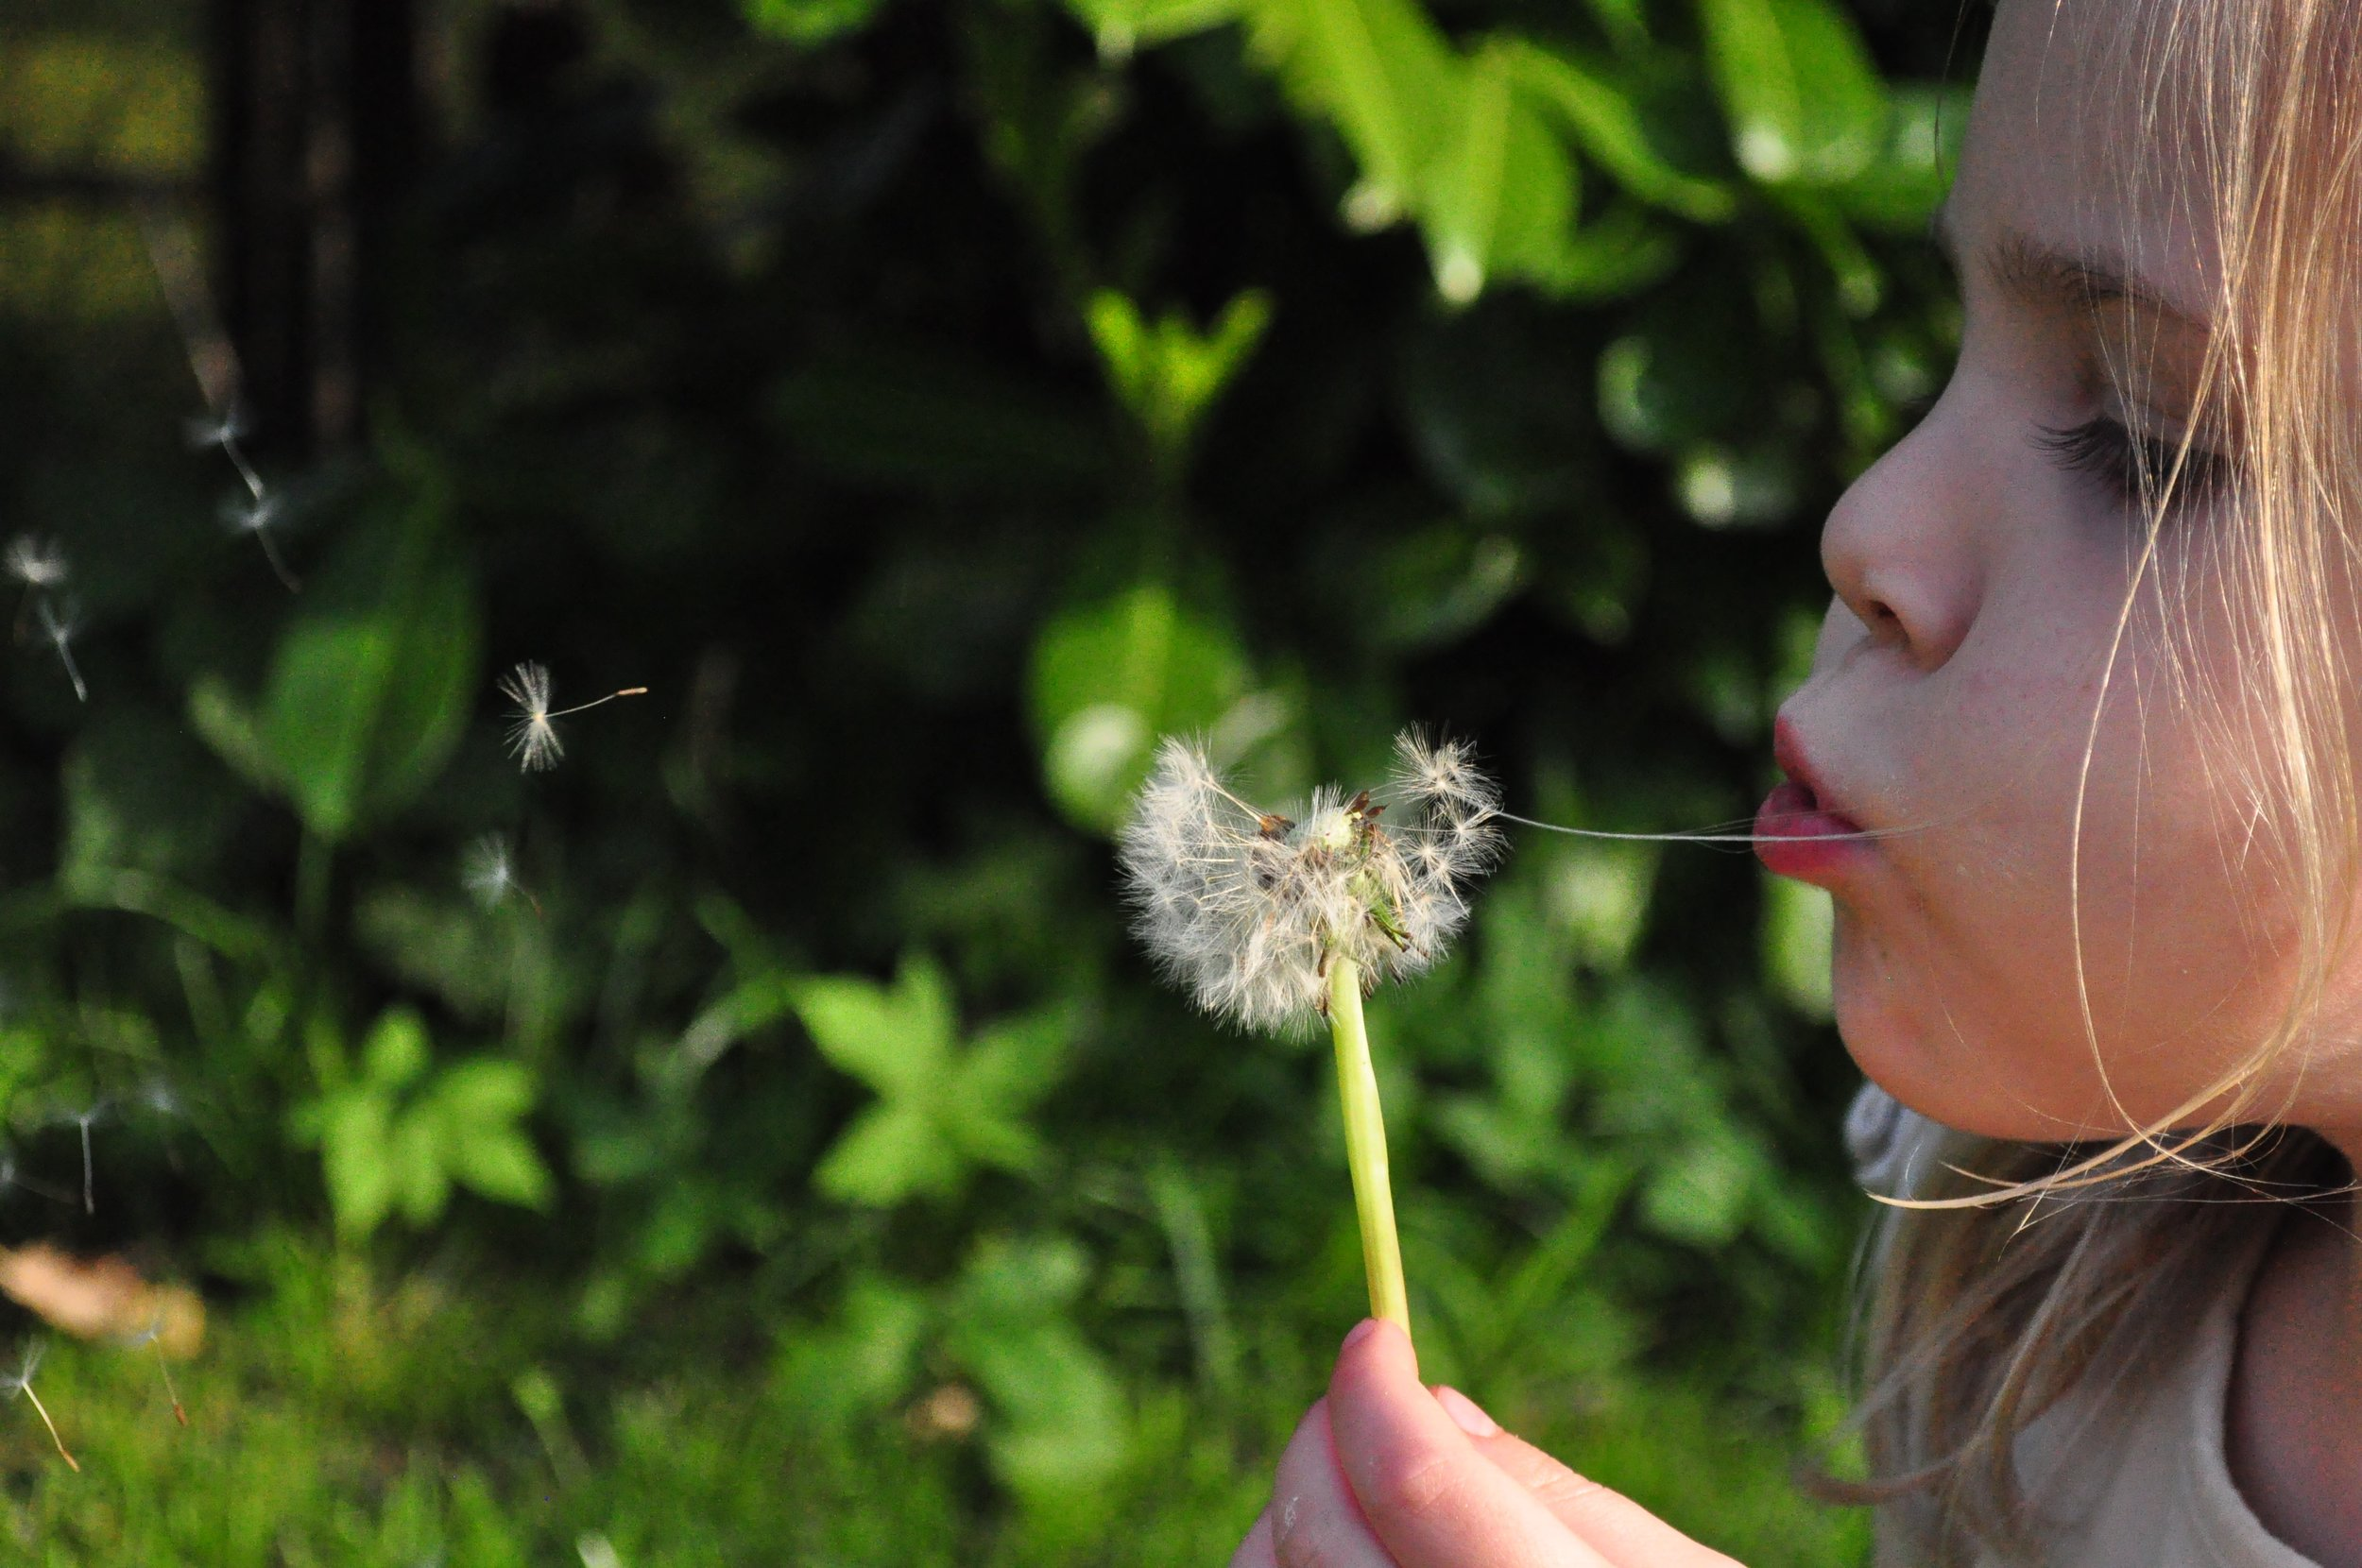 blowing-child-dandelion-seeds.jpg